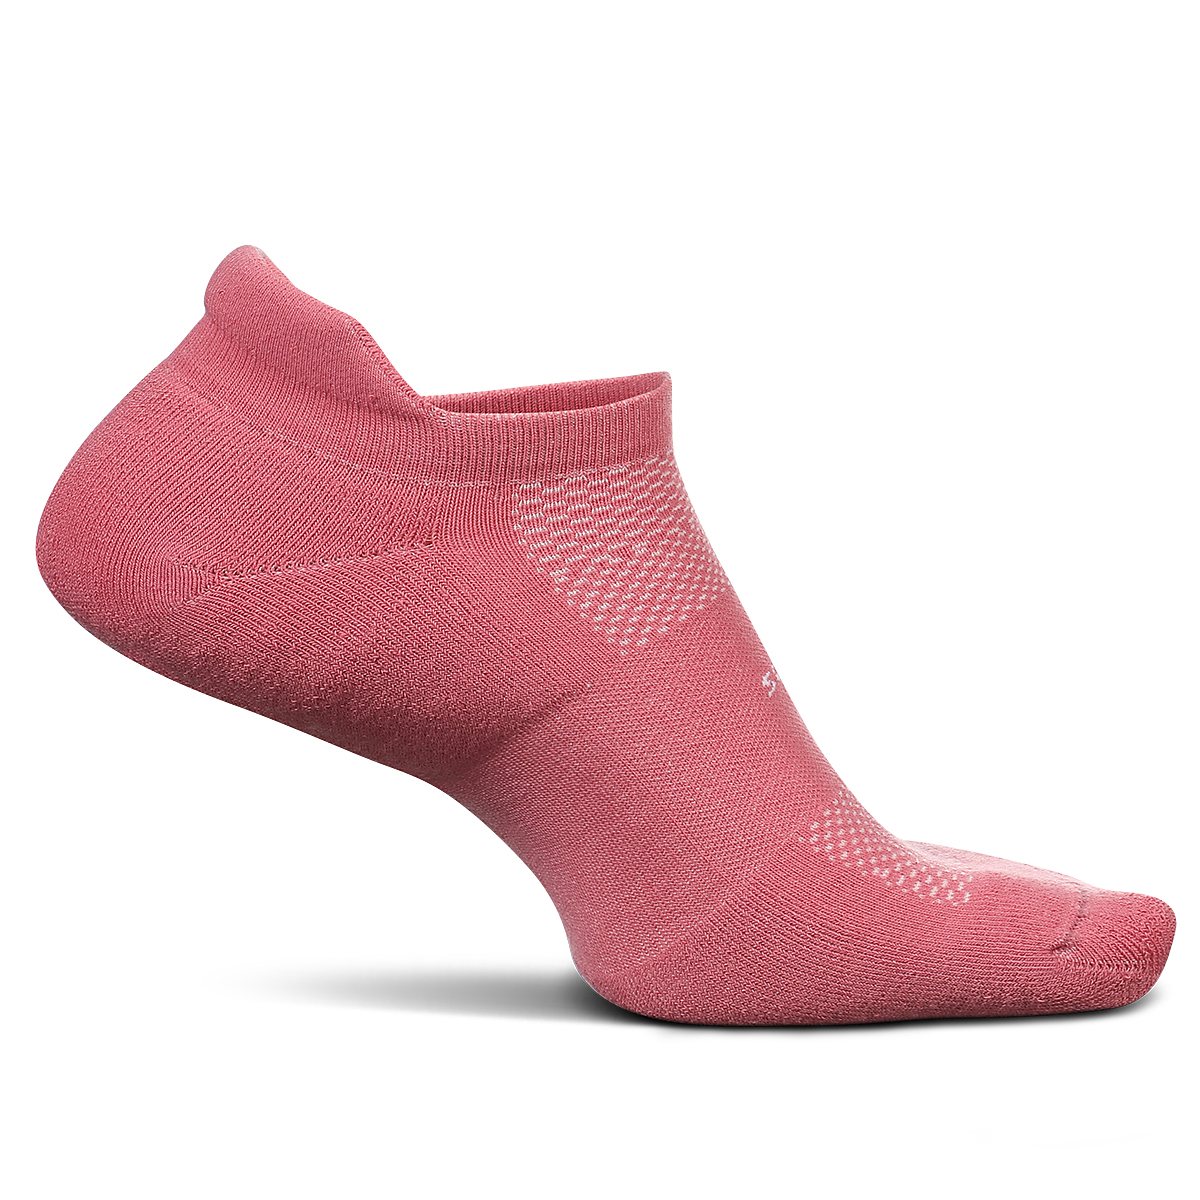 Feetures High Performance Cushion No Show Tab Socks, , large, image 1